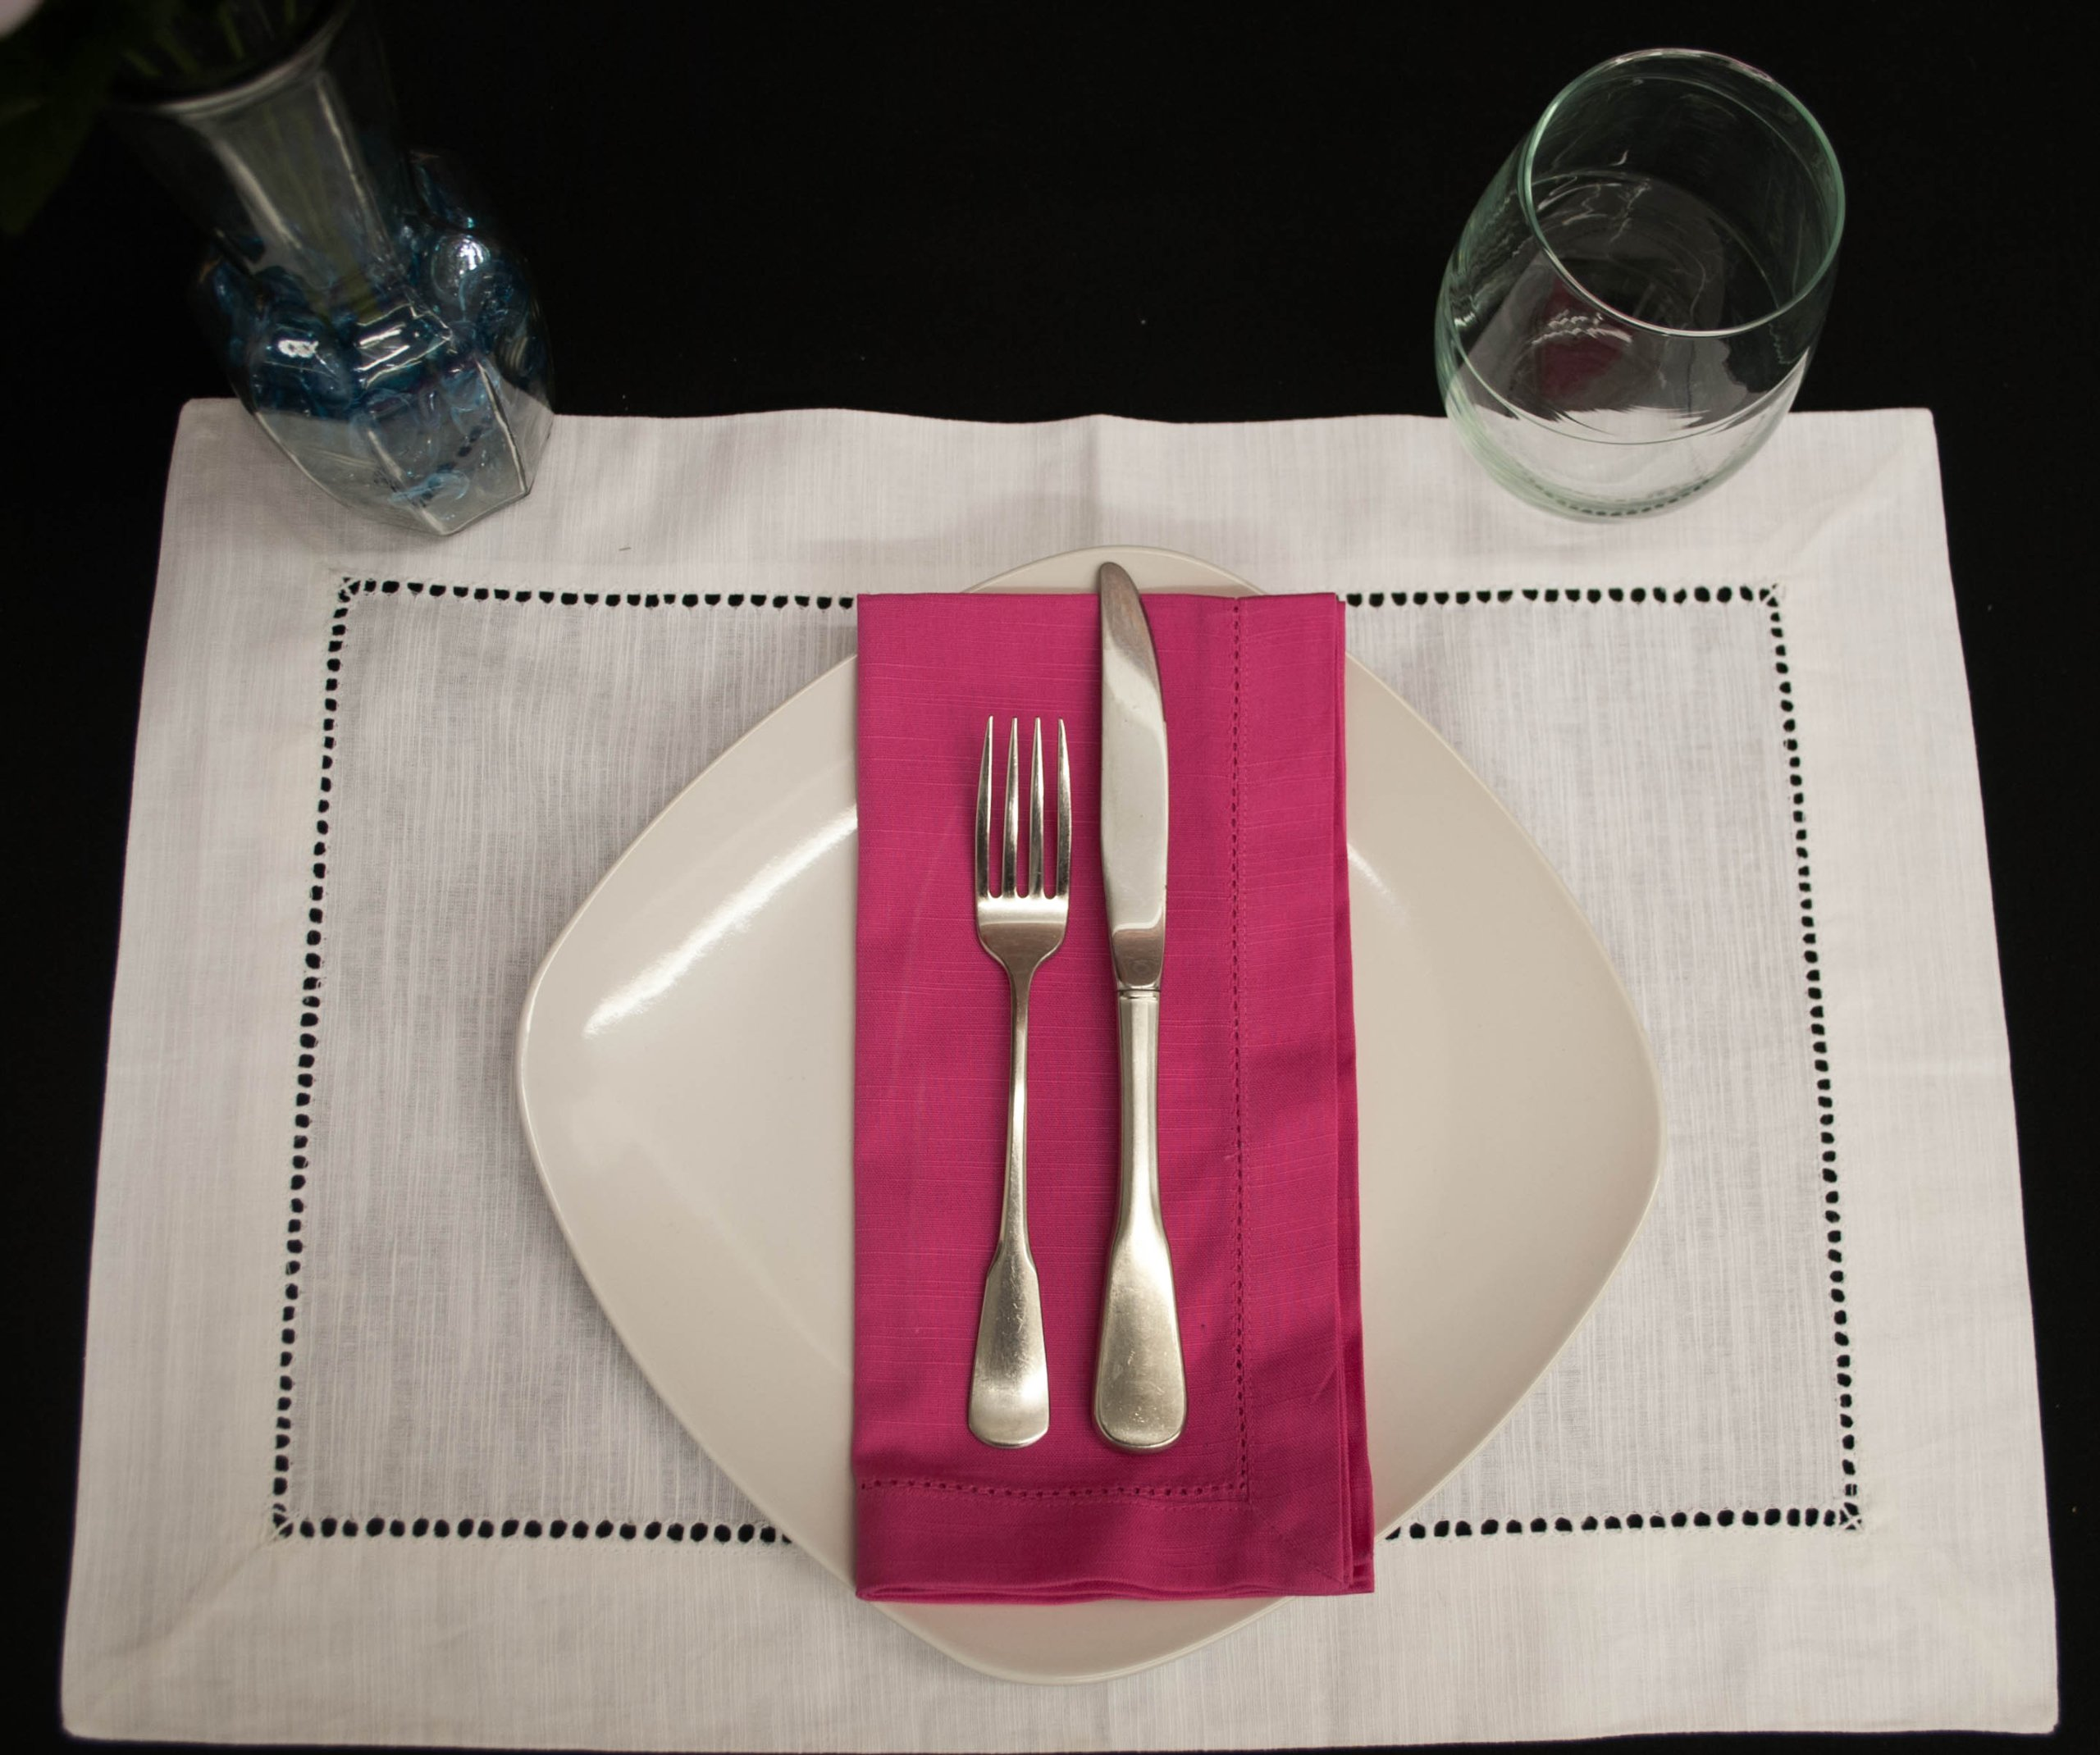 Hemstitch Dinner Napkins Hot Pink 1 Dozen by Something Different Linen (Image #2)